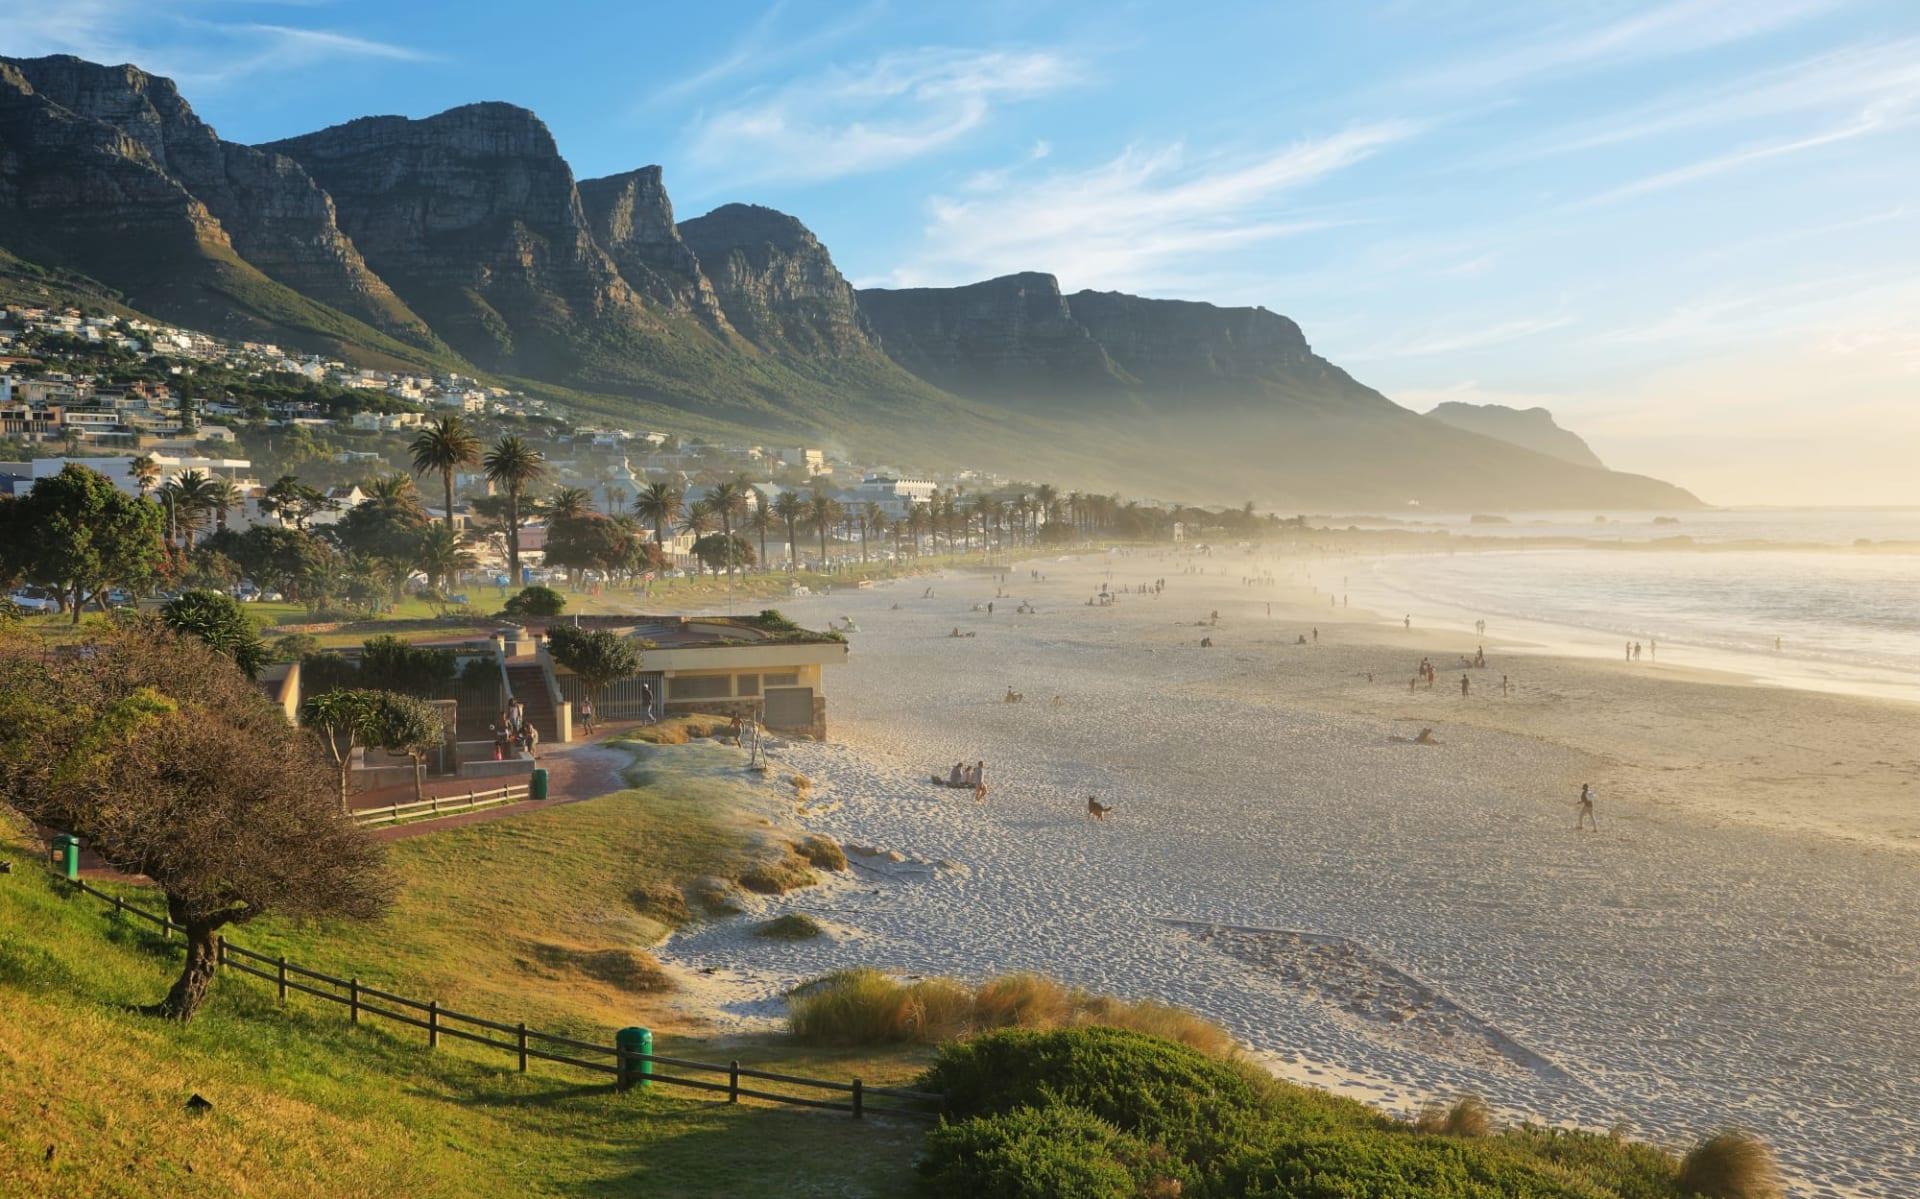 Südafrika erfahren ab Kapstadt: Kapstadt - Camps Bay